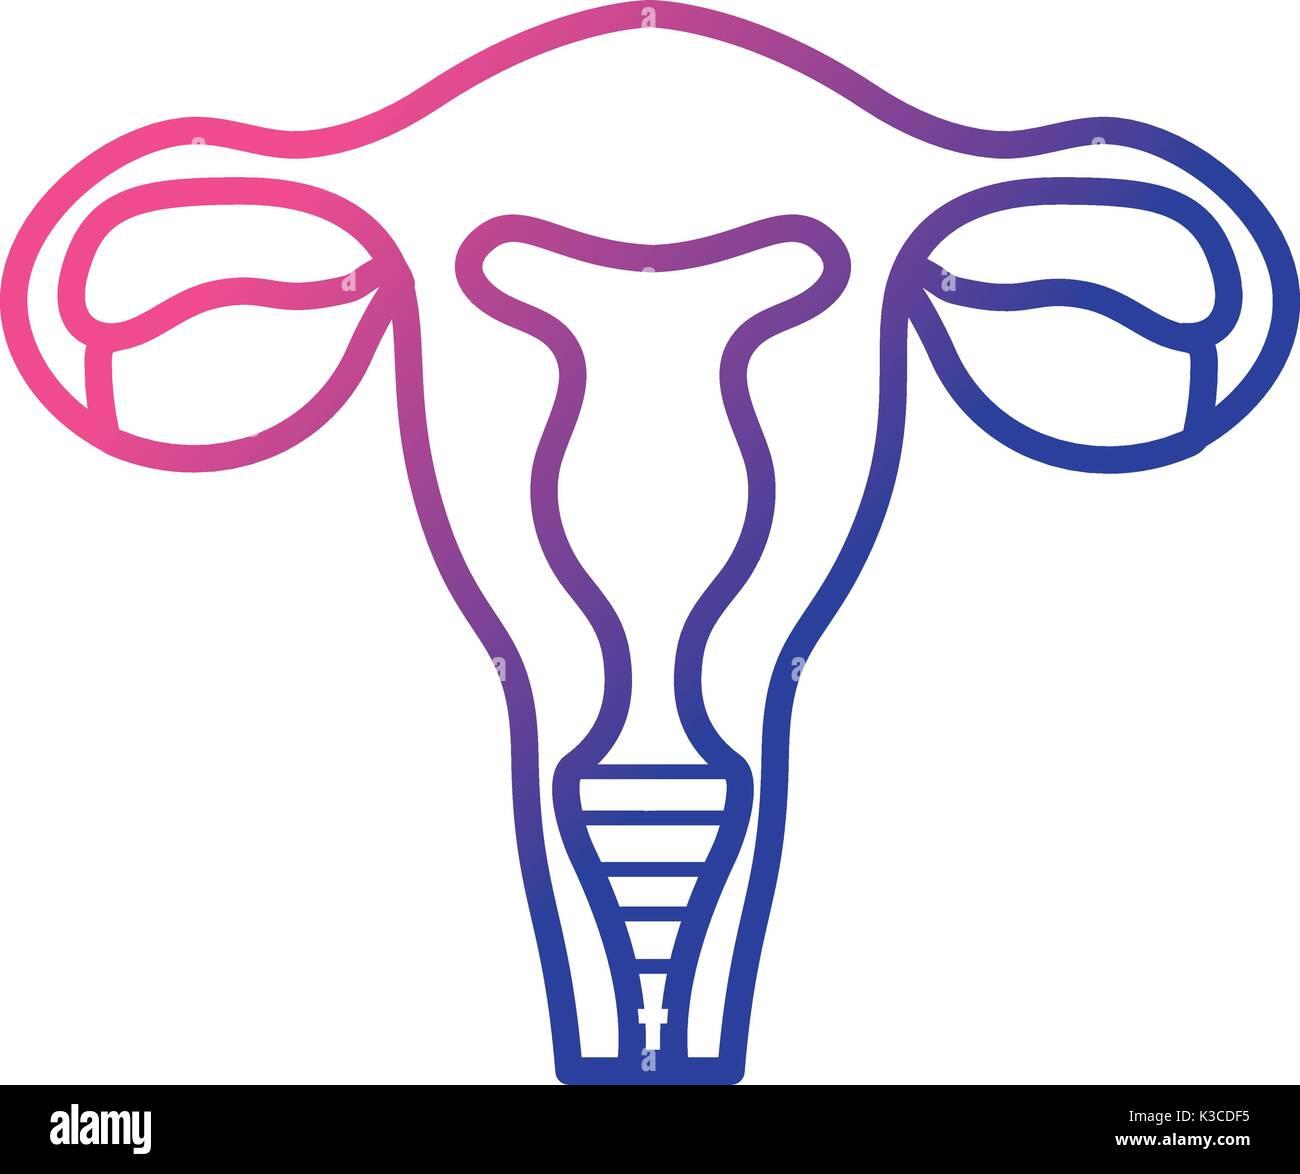 Uterus And Fallopian Tubes Stockfotos & Uterus And Fallopian Tubes ...